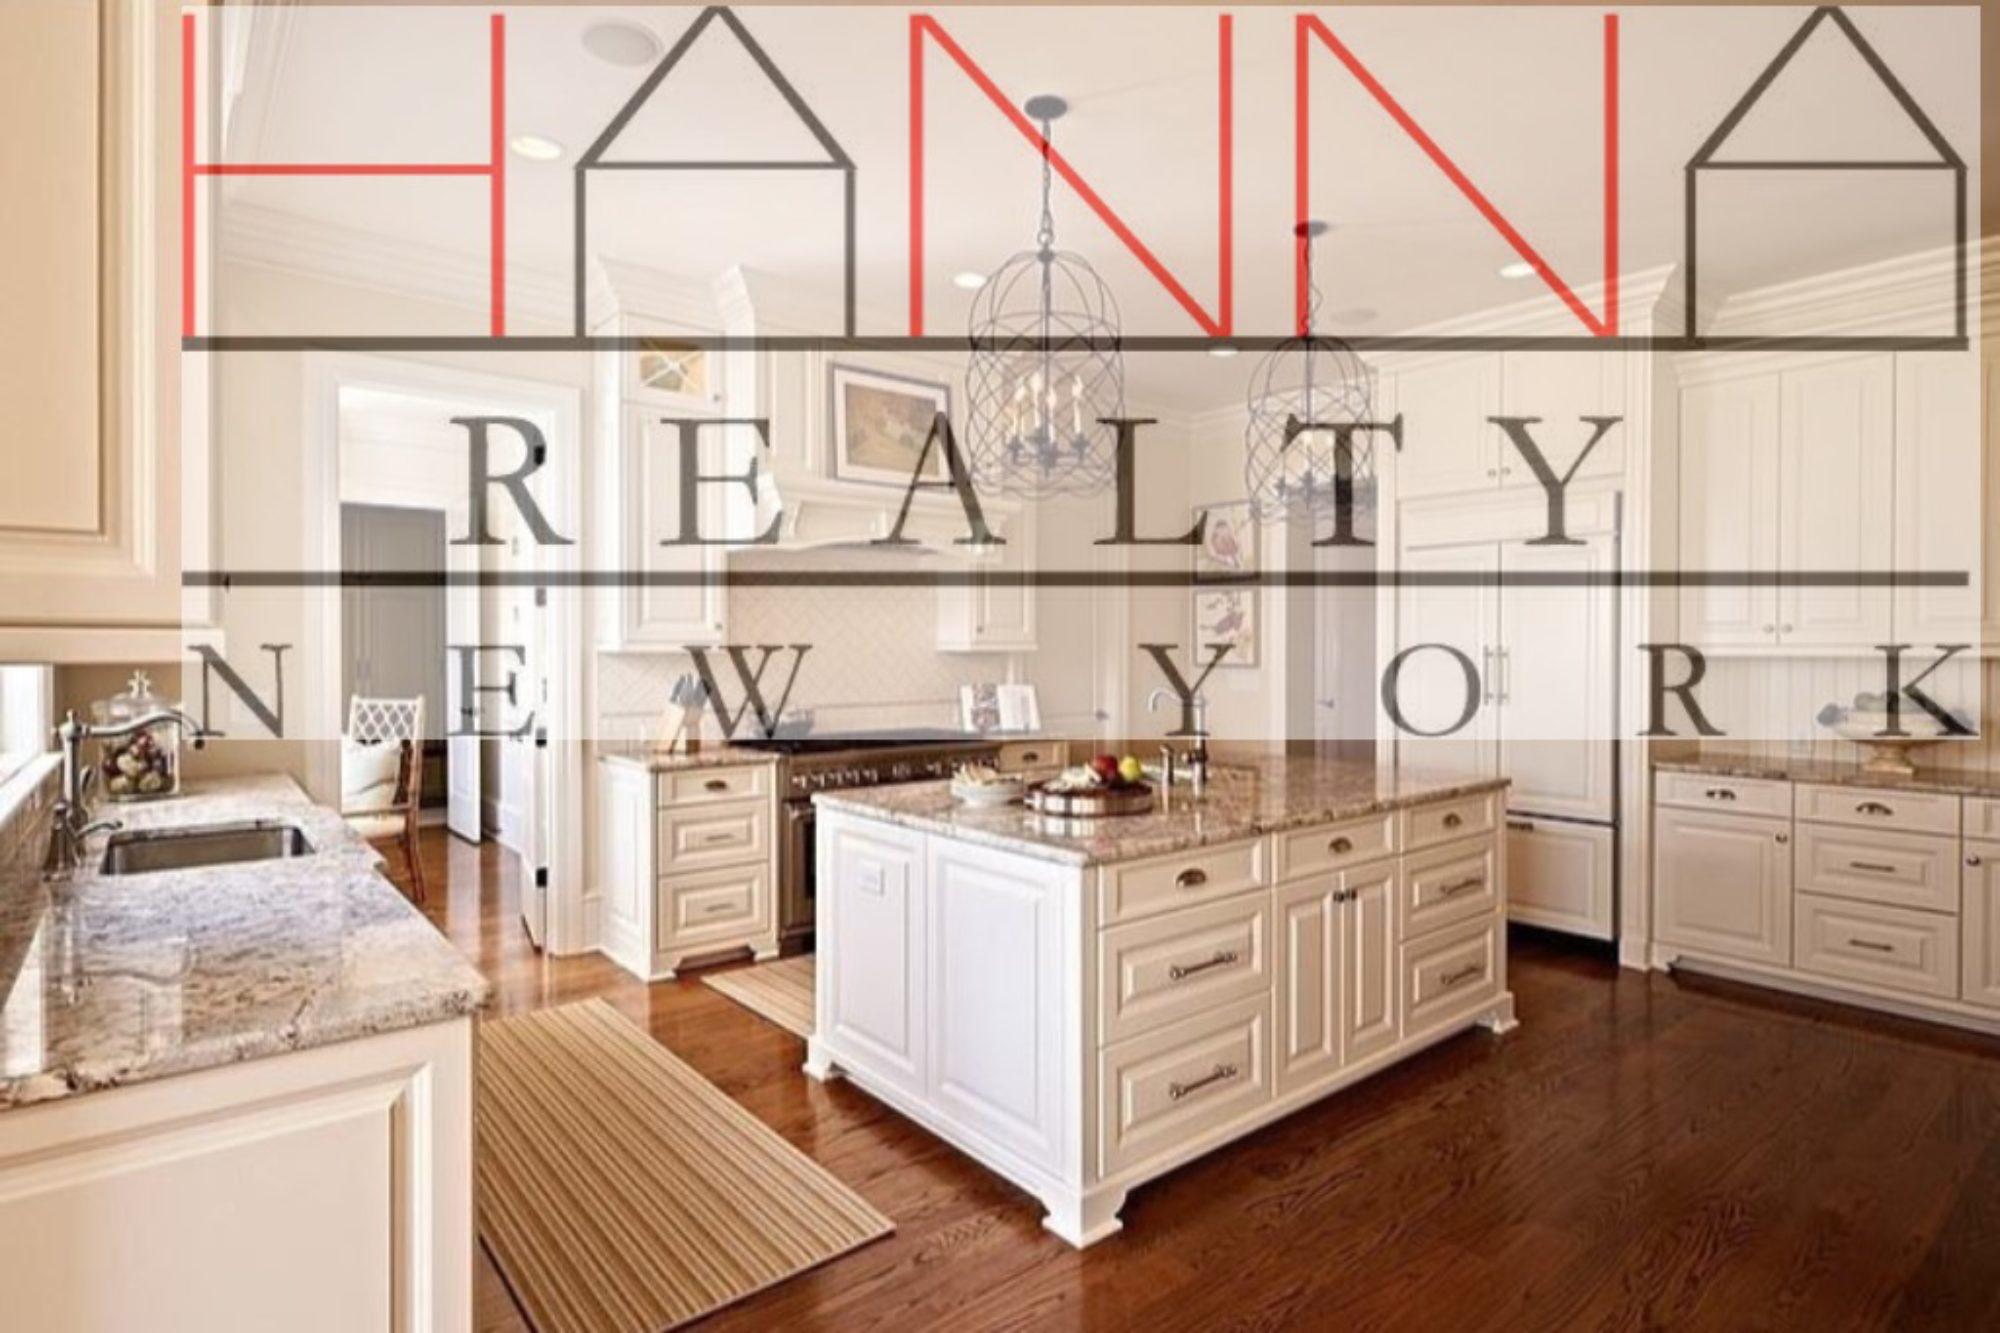 Hanna Realty LLC